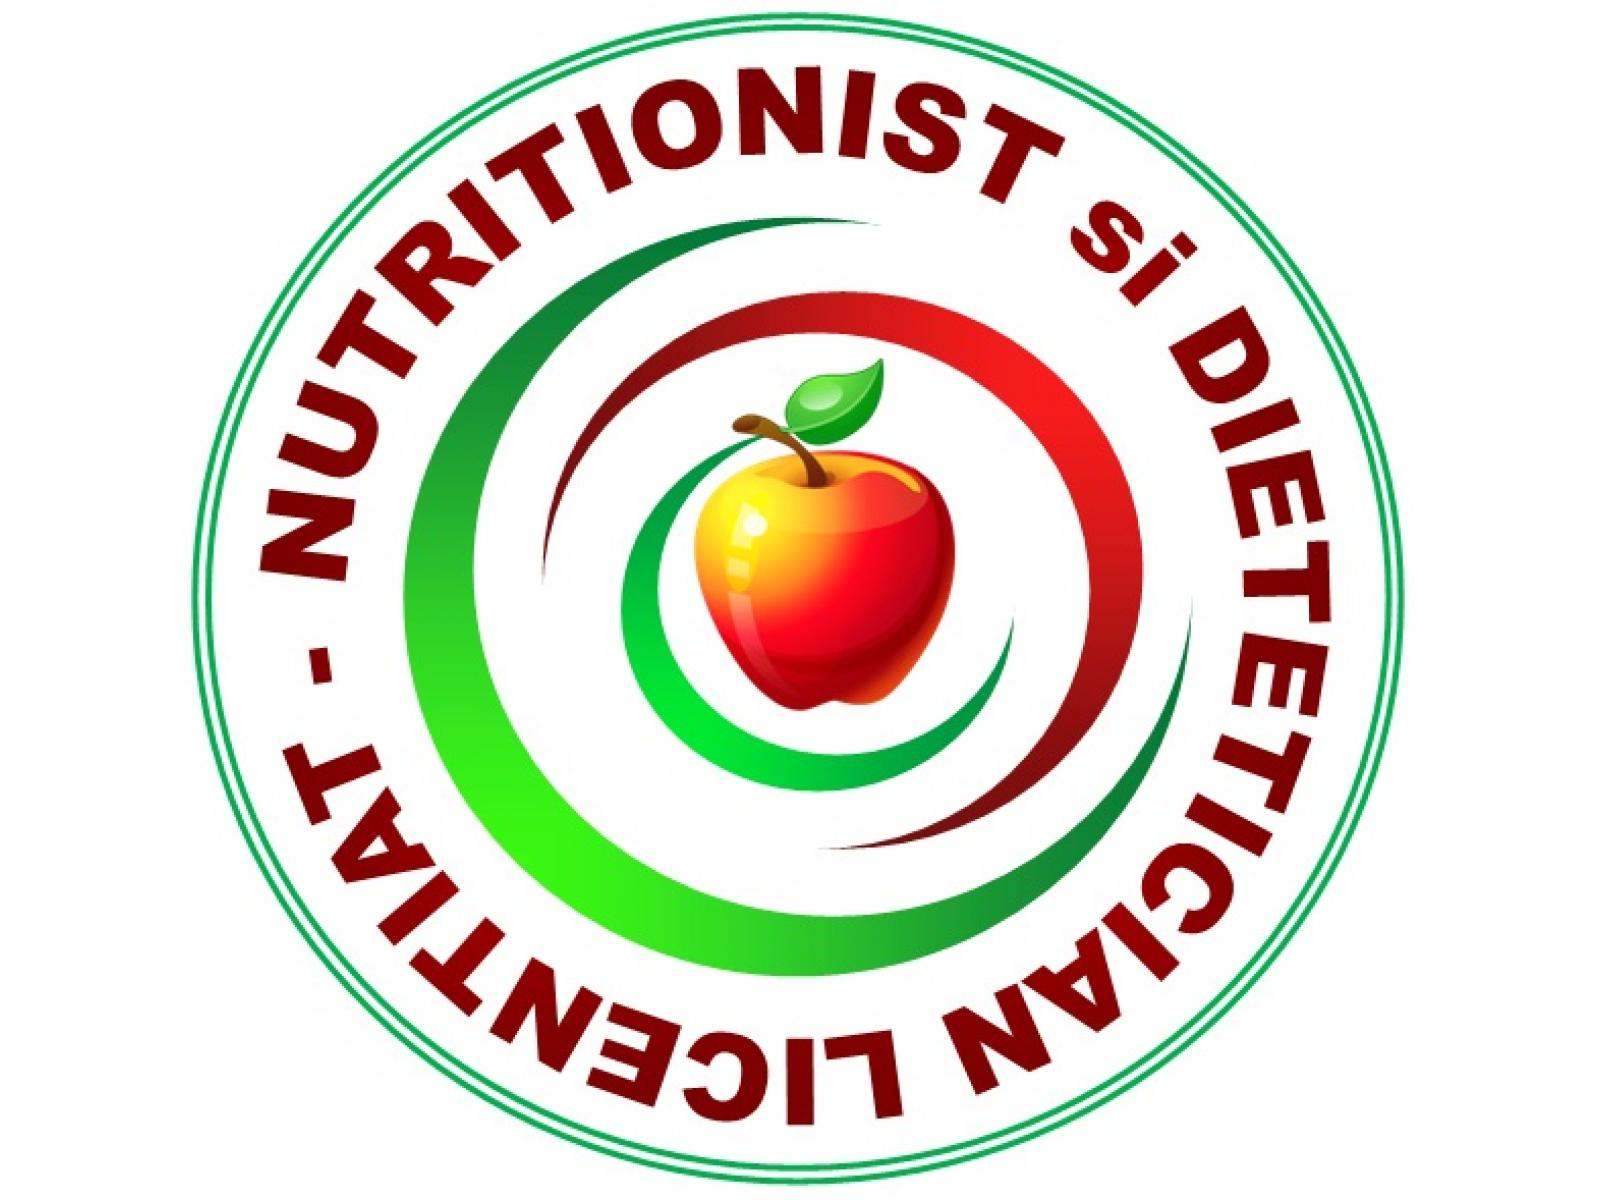 Cabinet de Nutritie si Dietetica - Constantin Tibirna - Nutritionist_Dietetician_Licentiat_Sigla.jpg